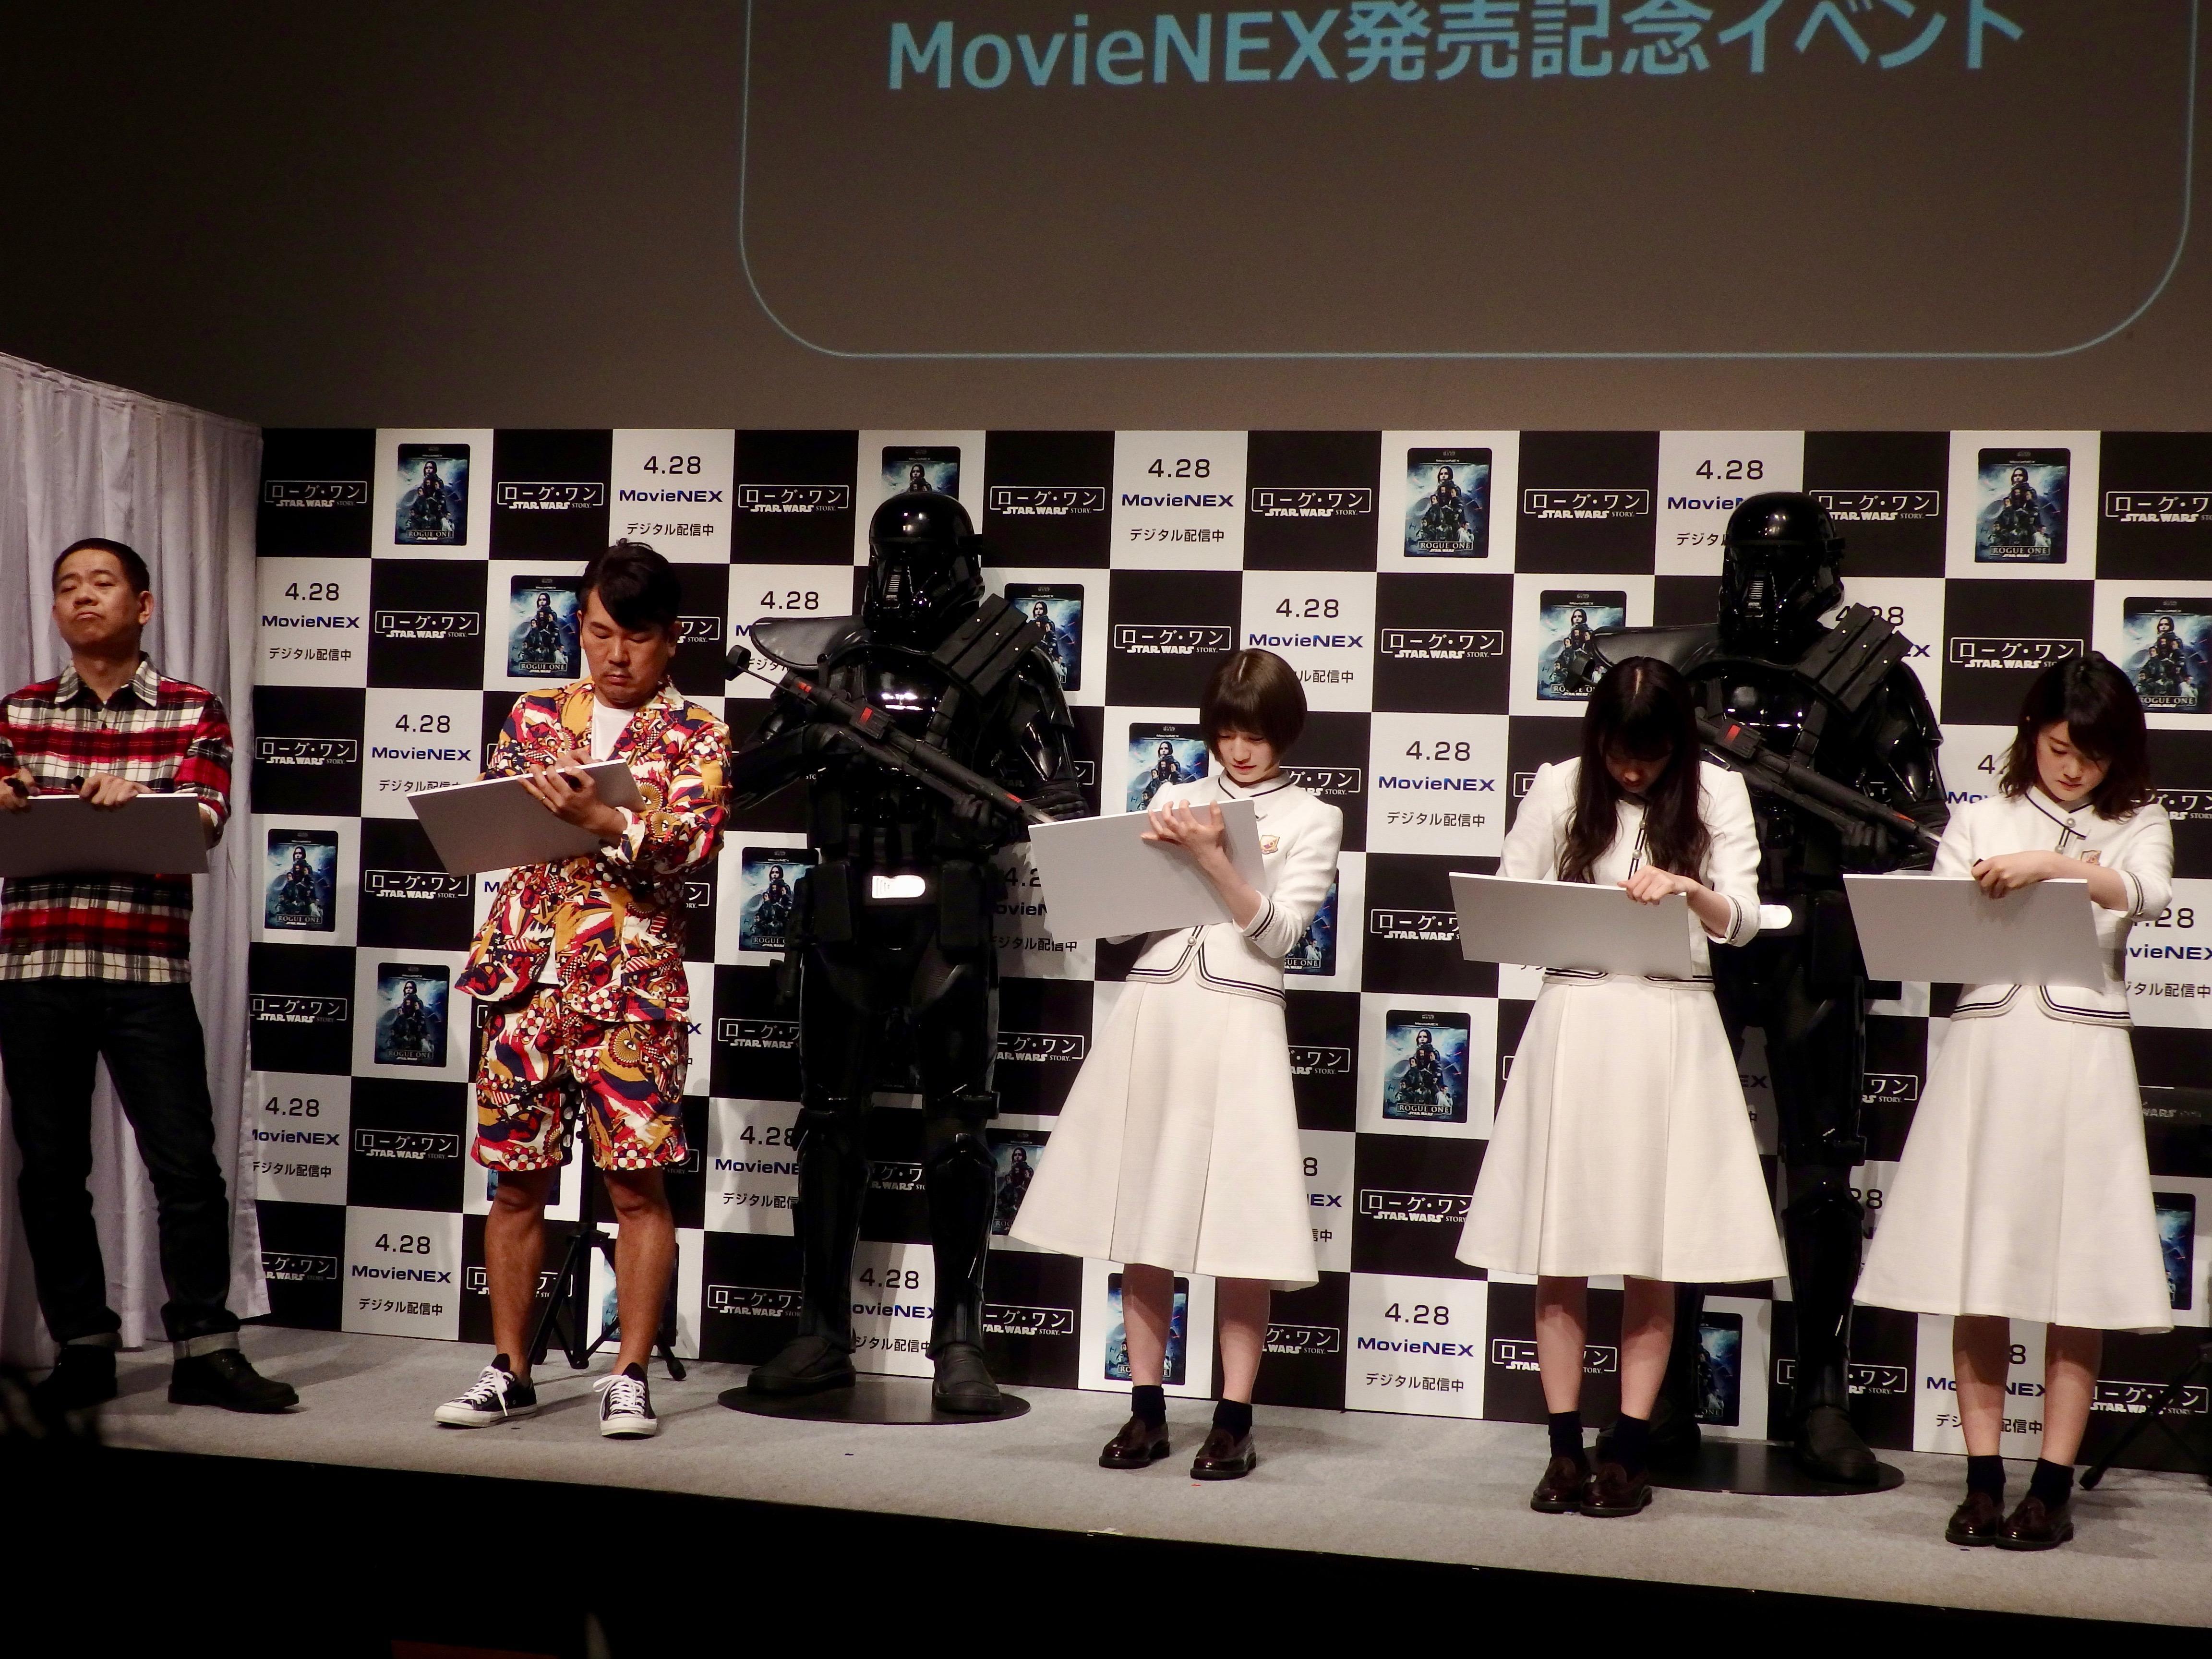 http://news.yoshimoto.co.jp/20170427235934-81508dc010fe5043e661b16b0383a8089e327c29.jpg